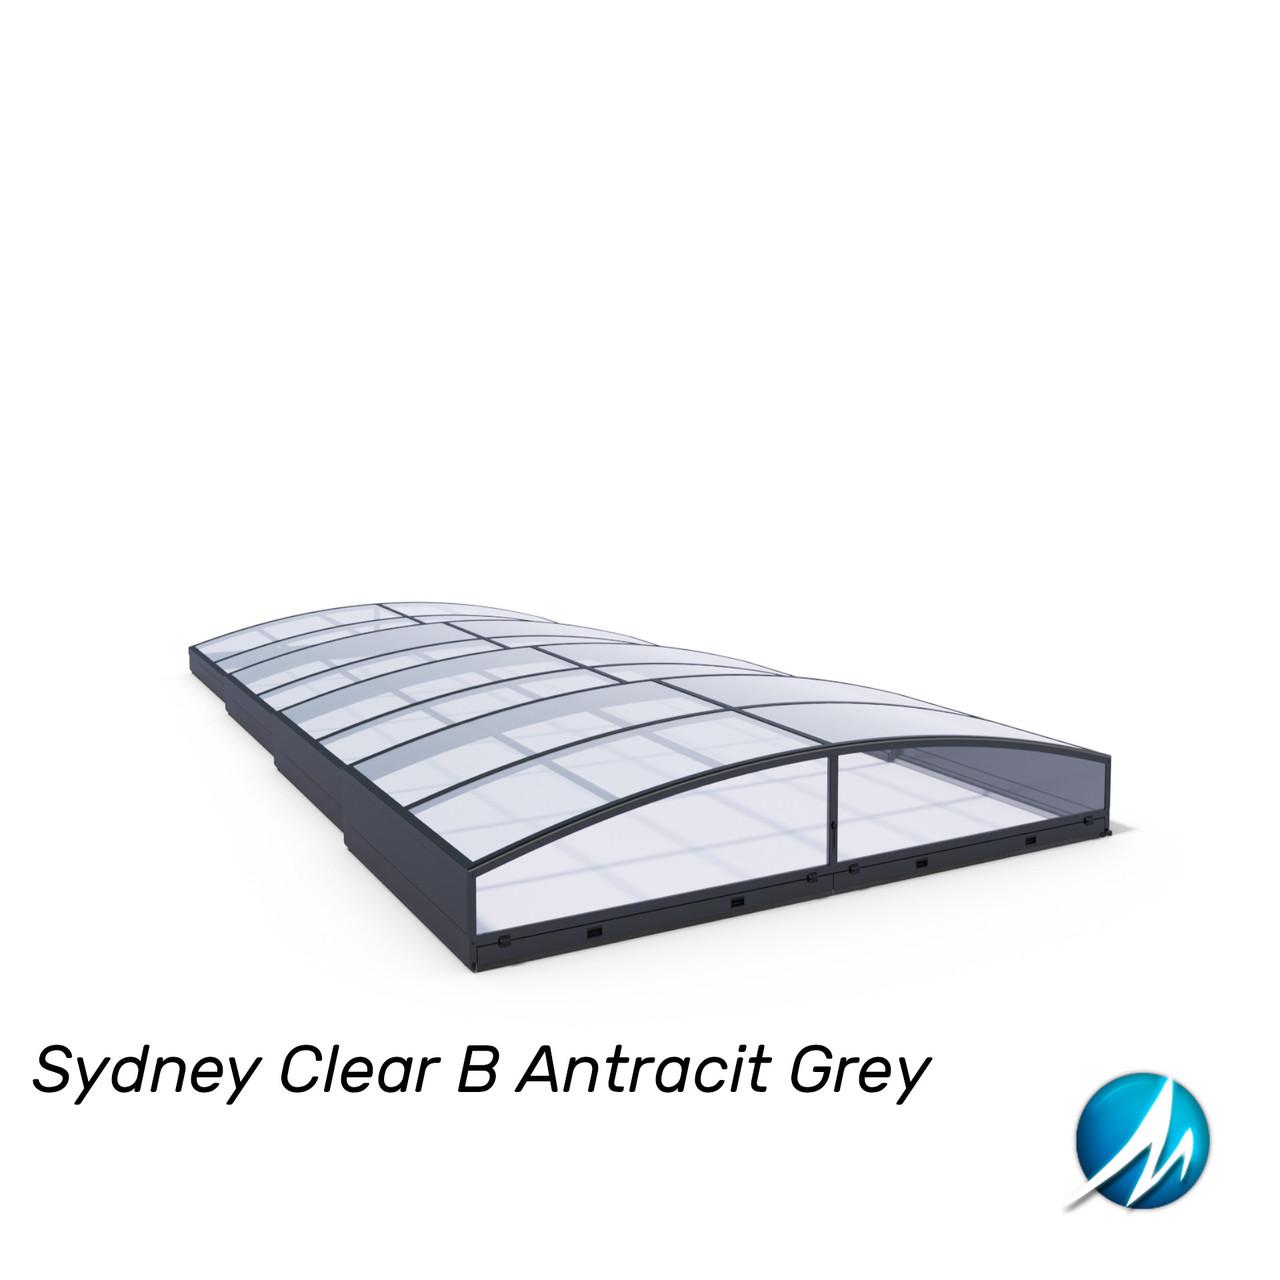 Павільйон для басейну Sydney Clear B 4,50х8,60х0,56м - Antracit Grey